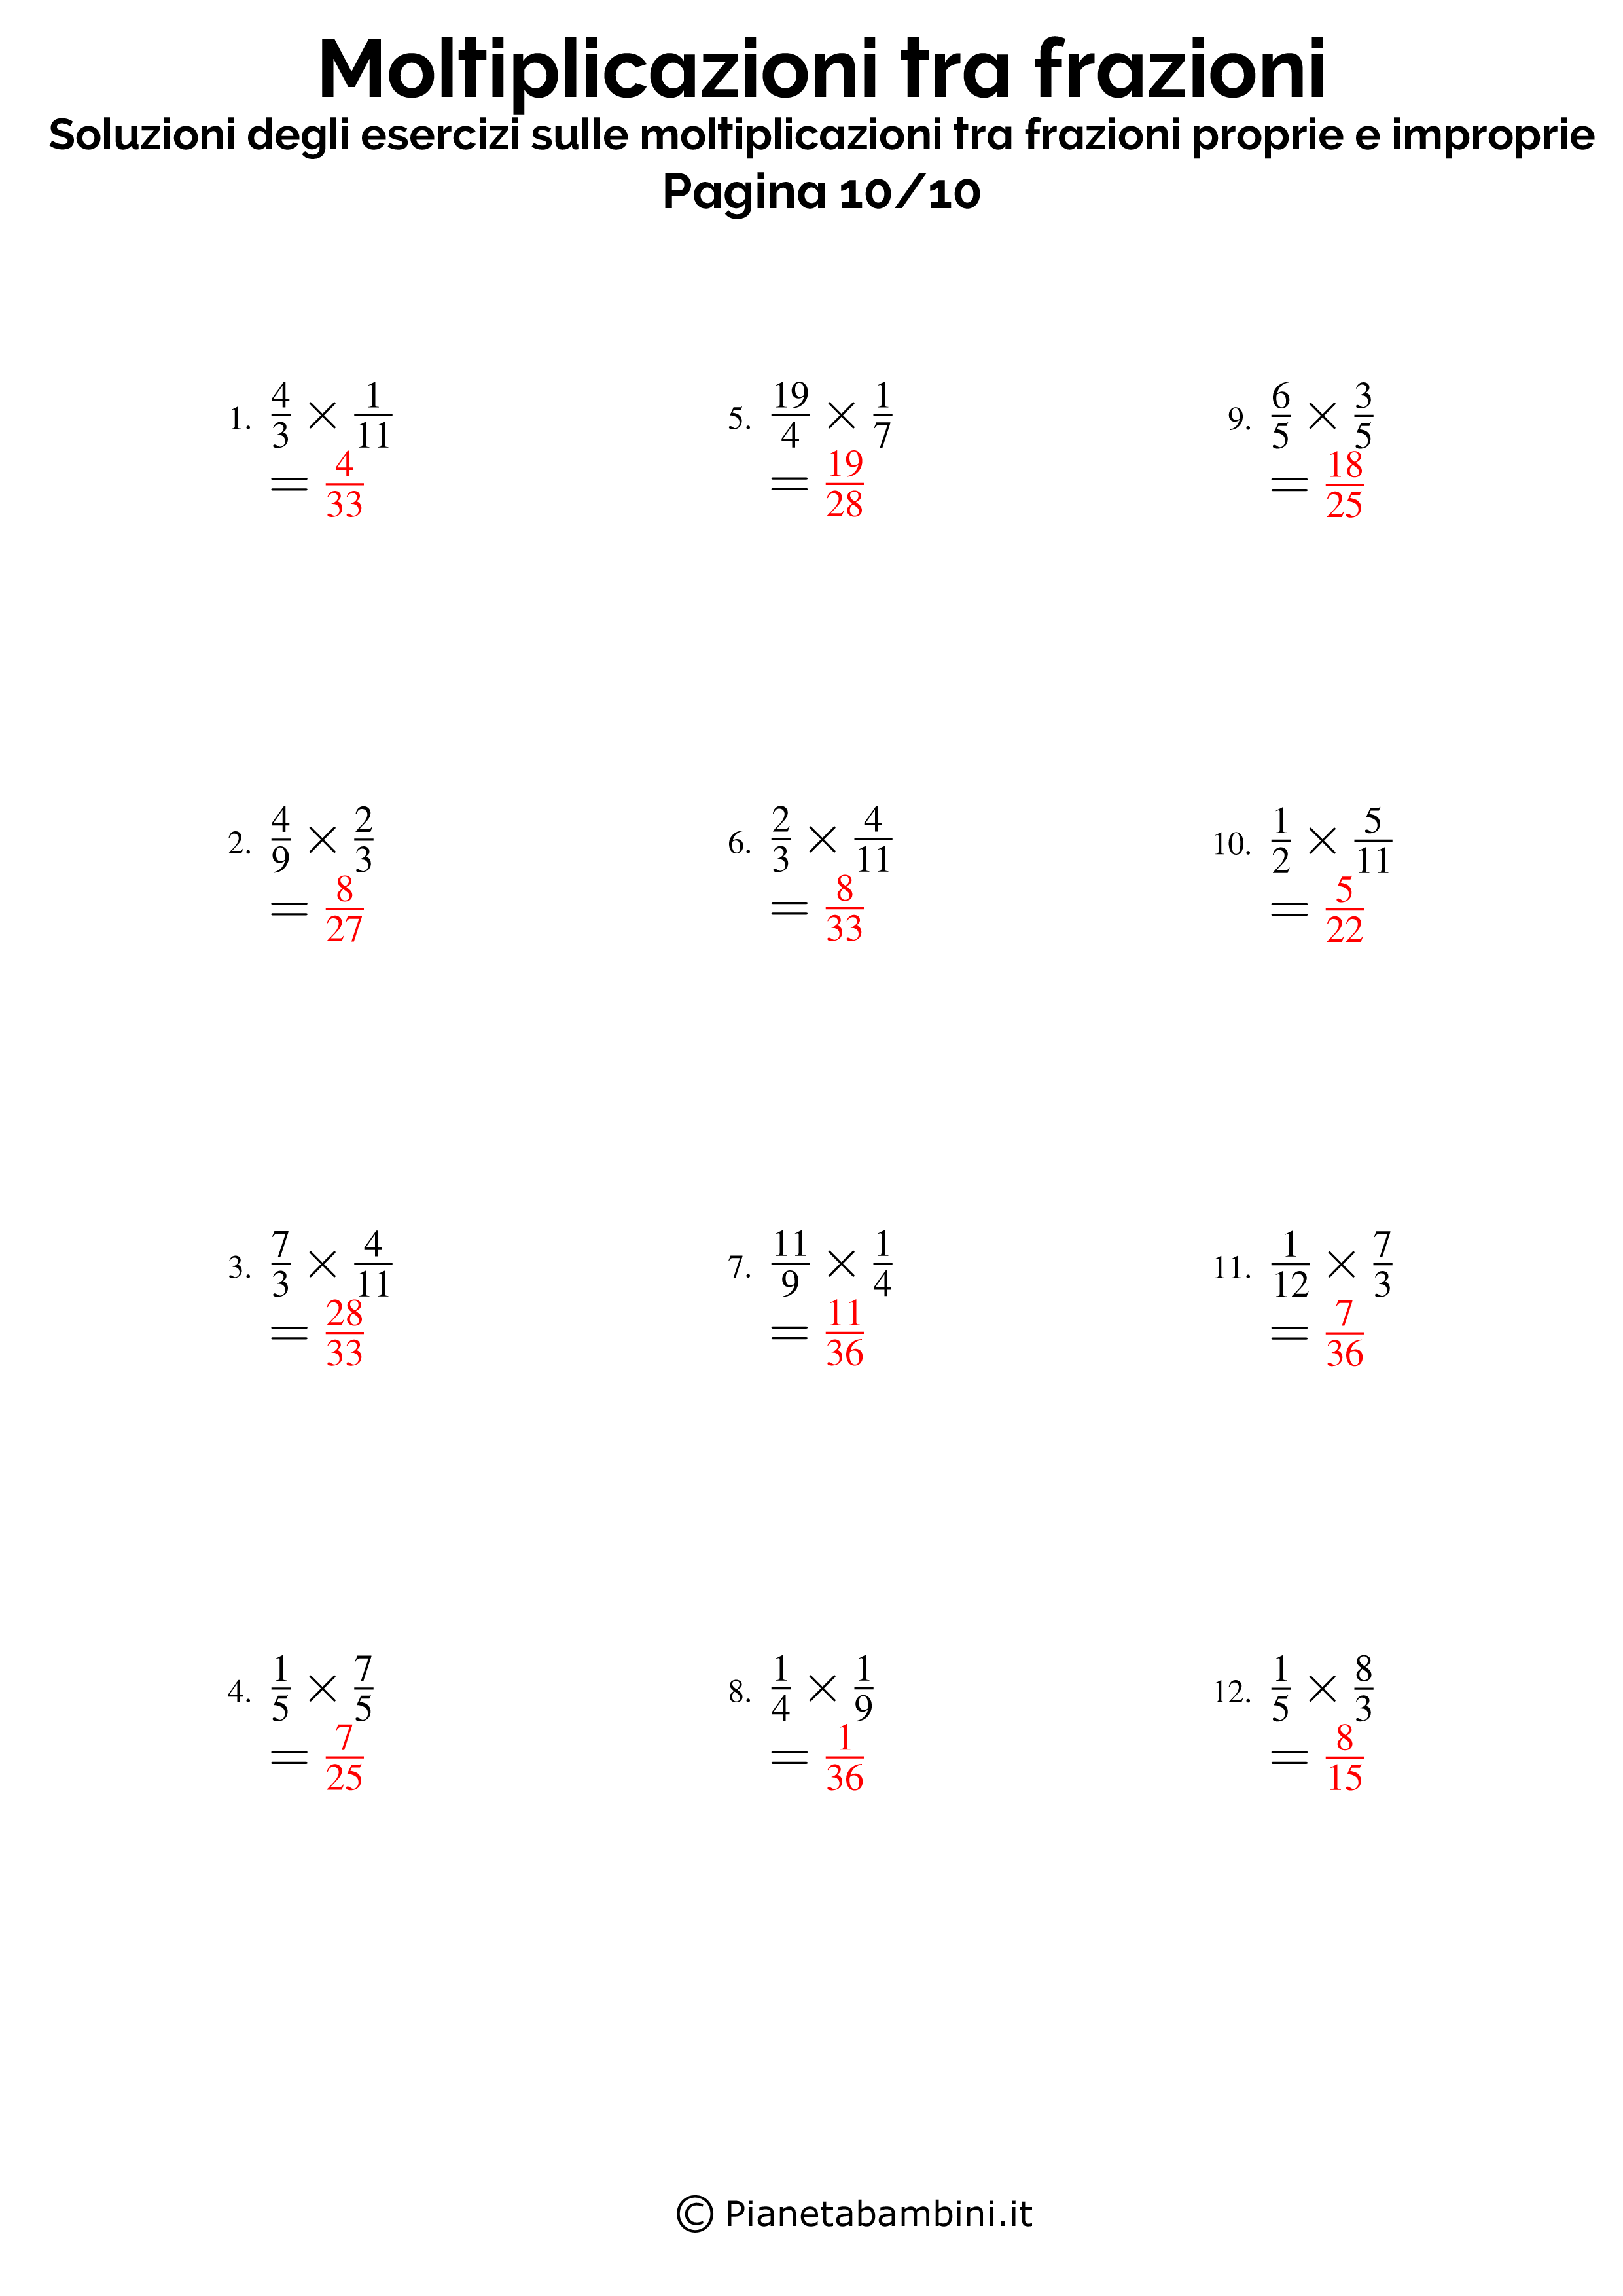 Soluzioni-Moltiplicazioni-Frazioni-Proprie-Improprie_10